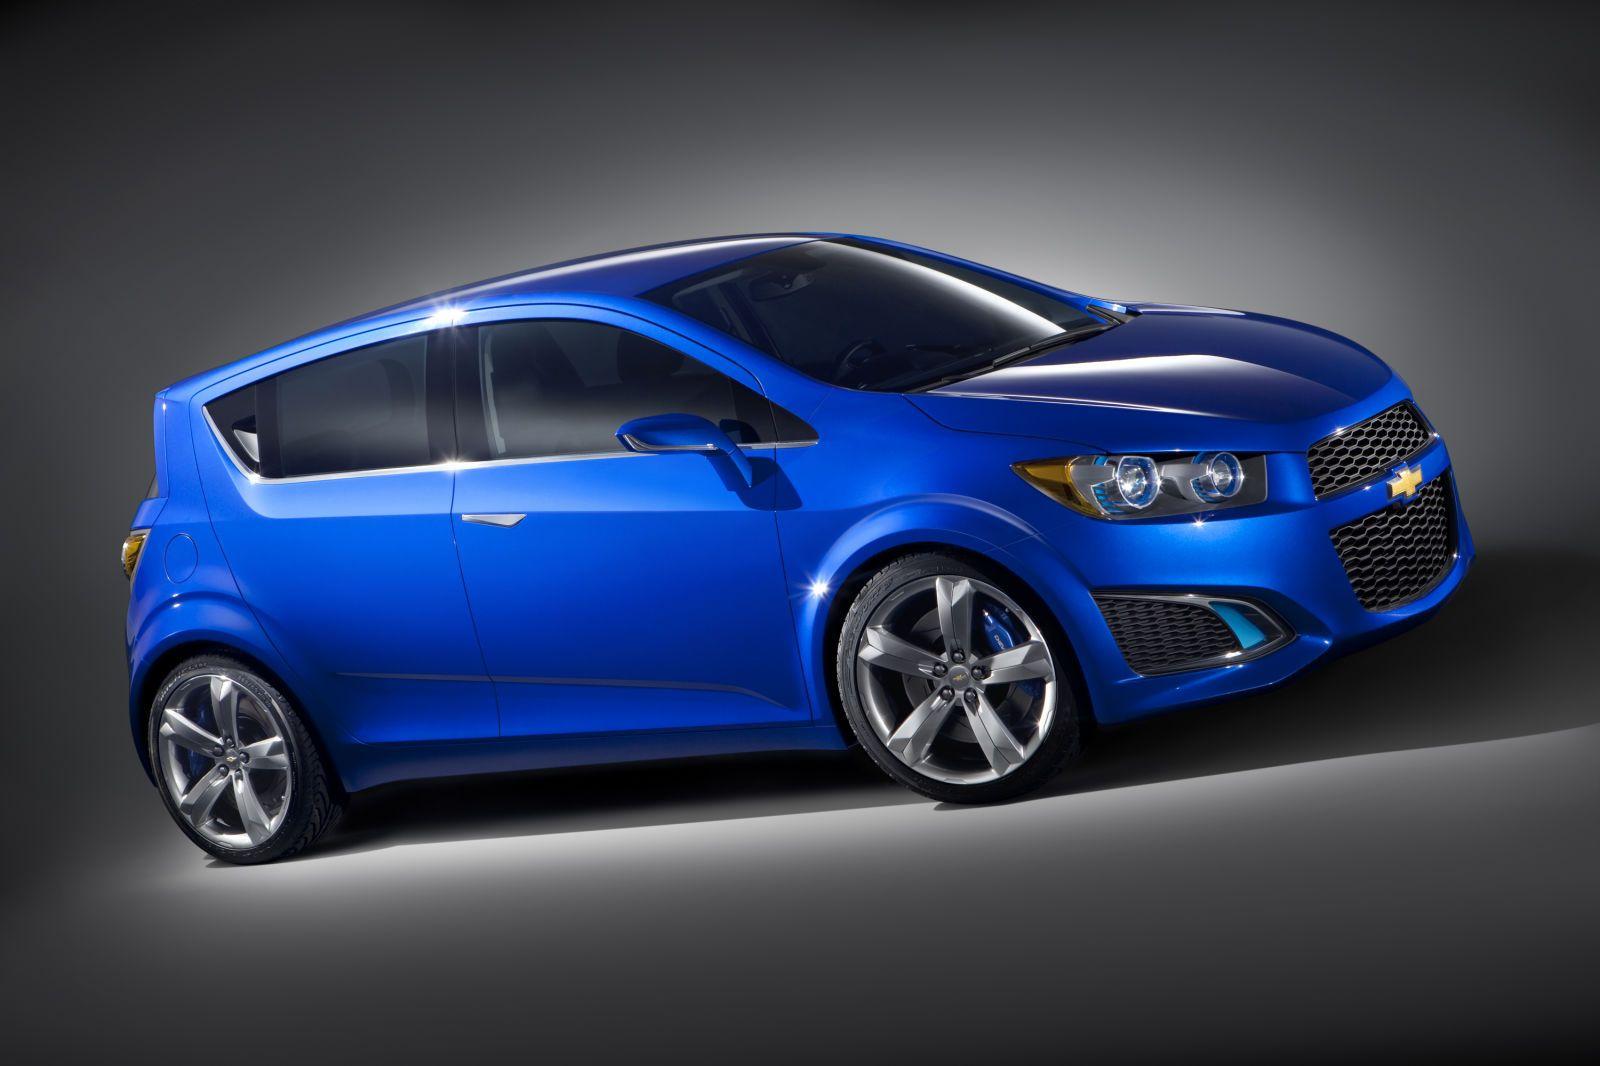 The 20 Best Hatchbacks Under 25 000 Chevrolet Sonic Chevrolet Sonic Hatchback Chevy Sonic